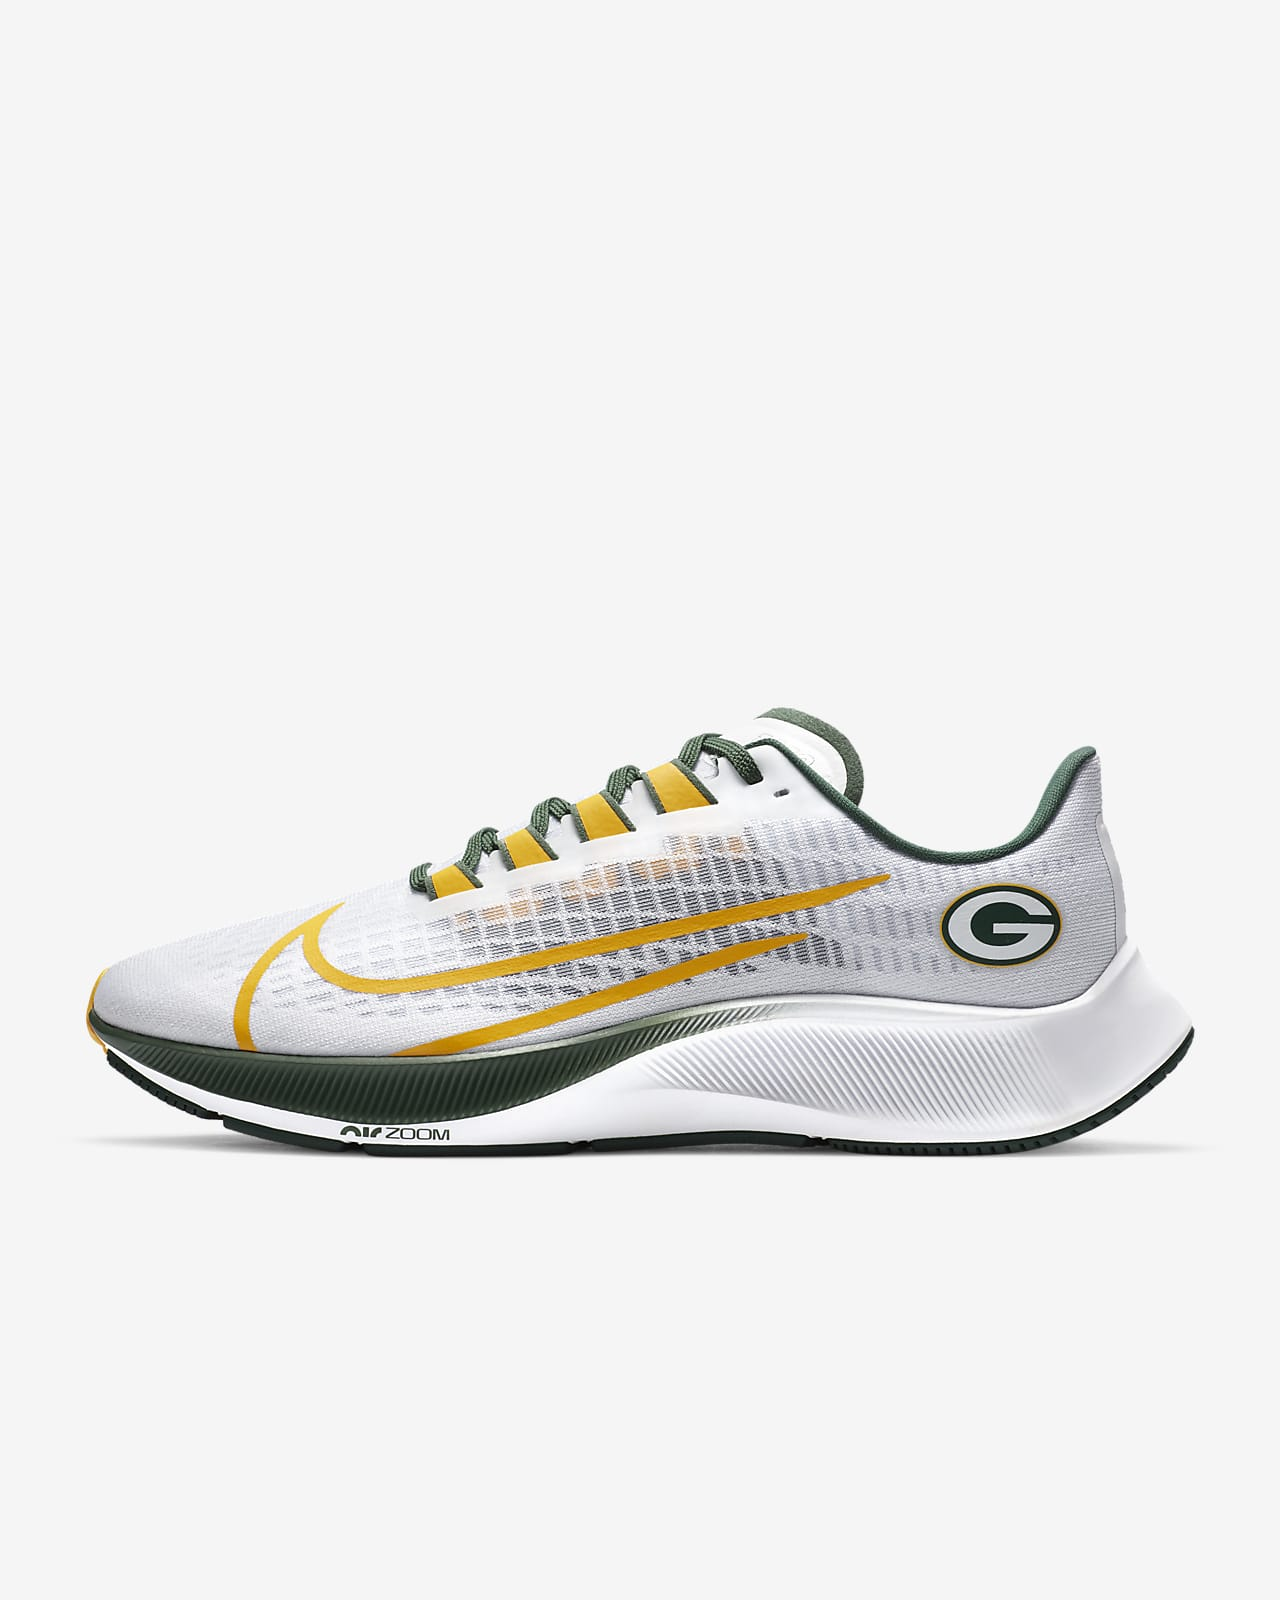 Nike Air Zoom Pegasus 37 (Green Bay Packers) Running Shoe